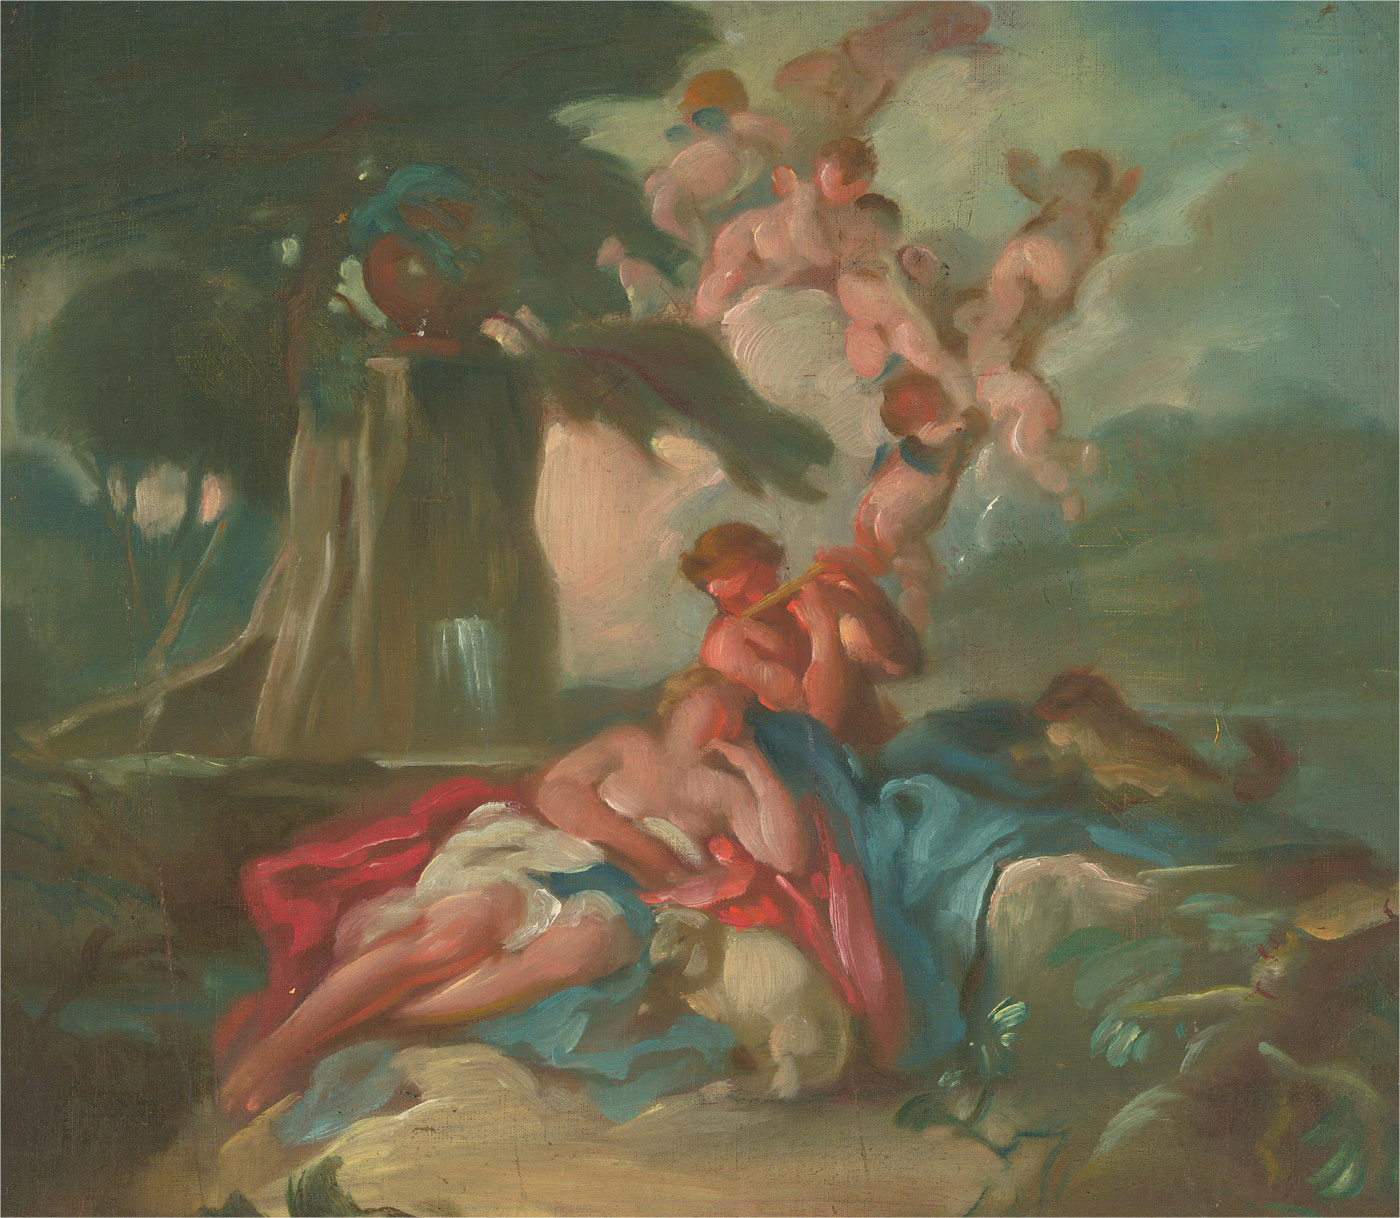 Giorgio Matteo Aicardi (1891-1985) - Early 20th Century Oil, Fresco Study